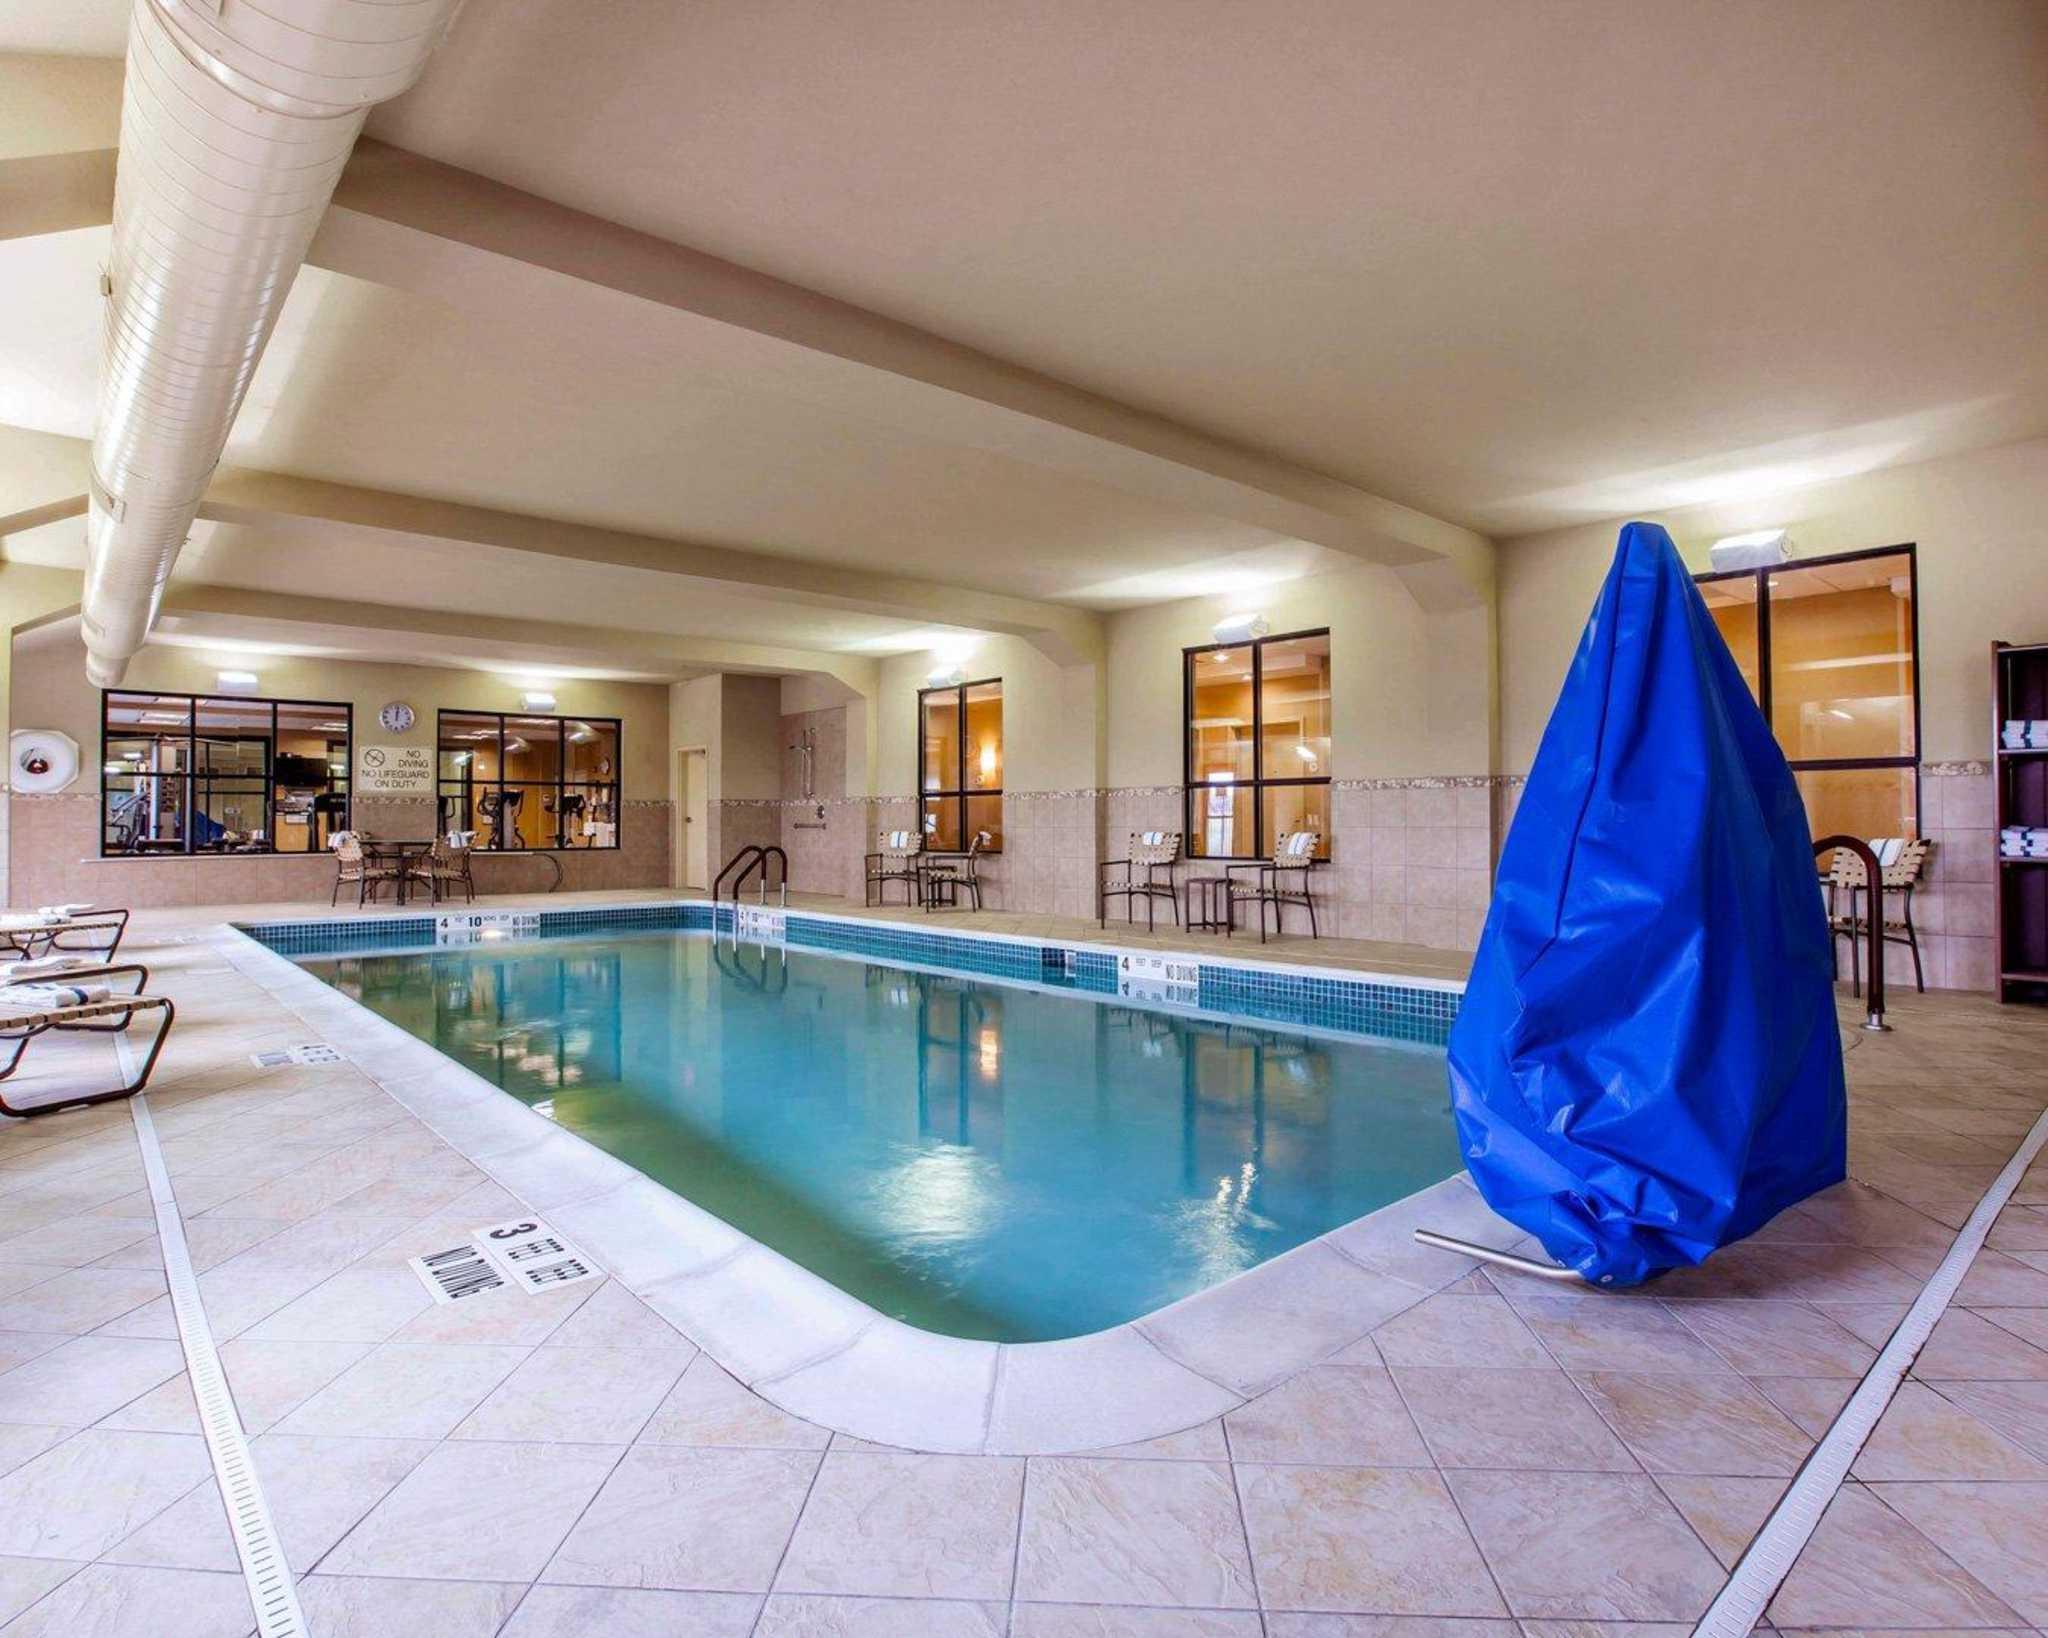 Comfort Inn & Suites adj to Akwesasne Mohawk Casino image 25